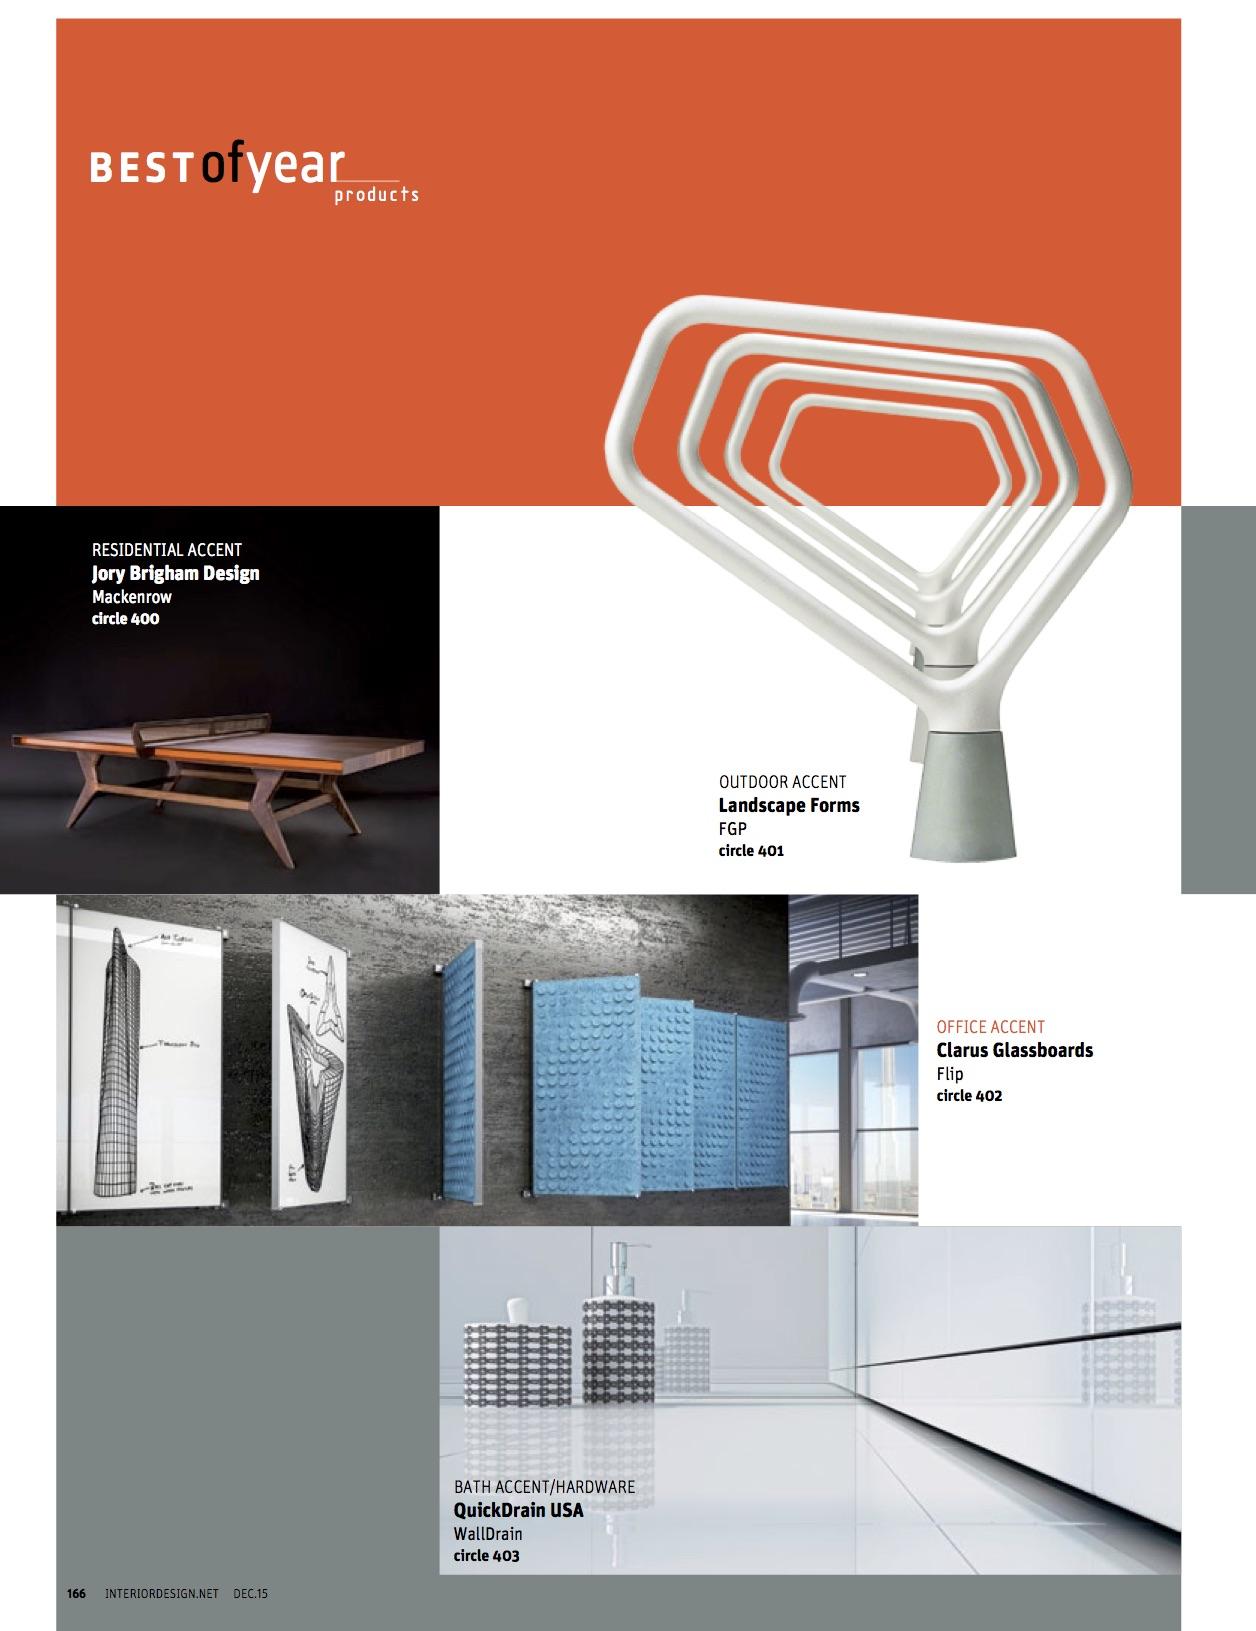 Interior Design Magazine - December 2015 - BOY - JB3.jpg